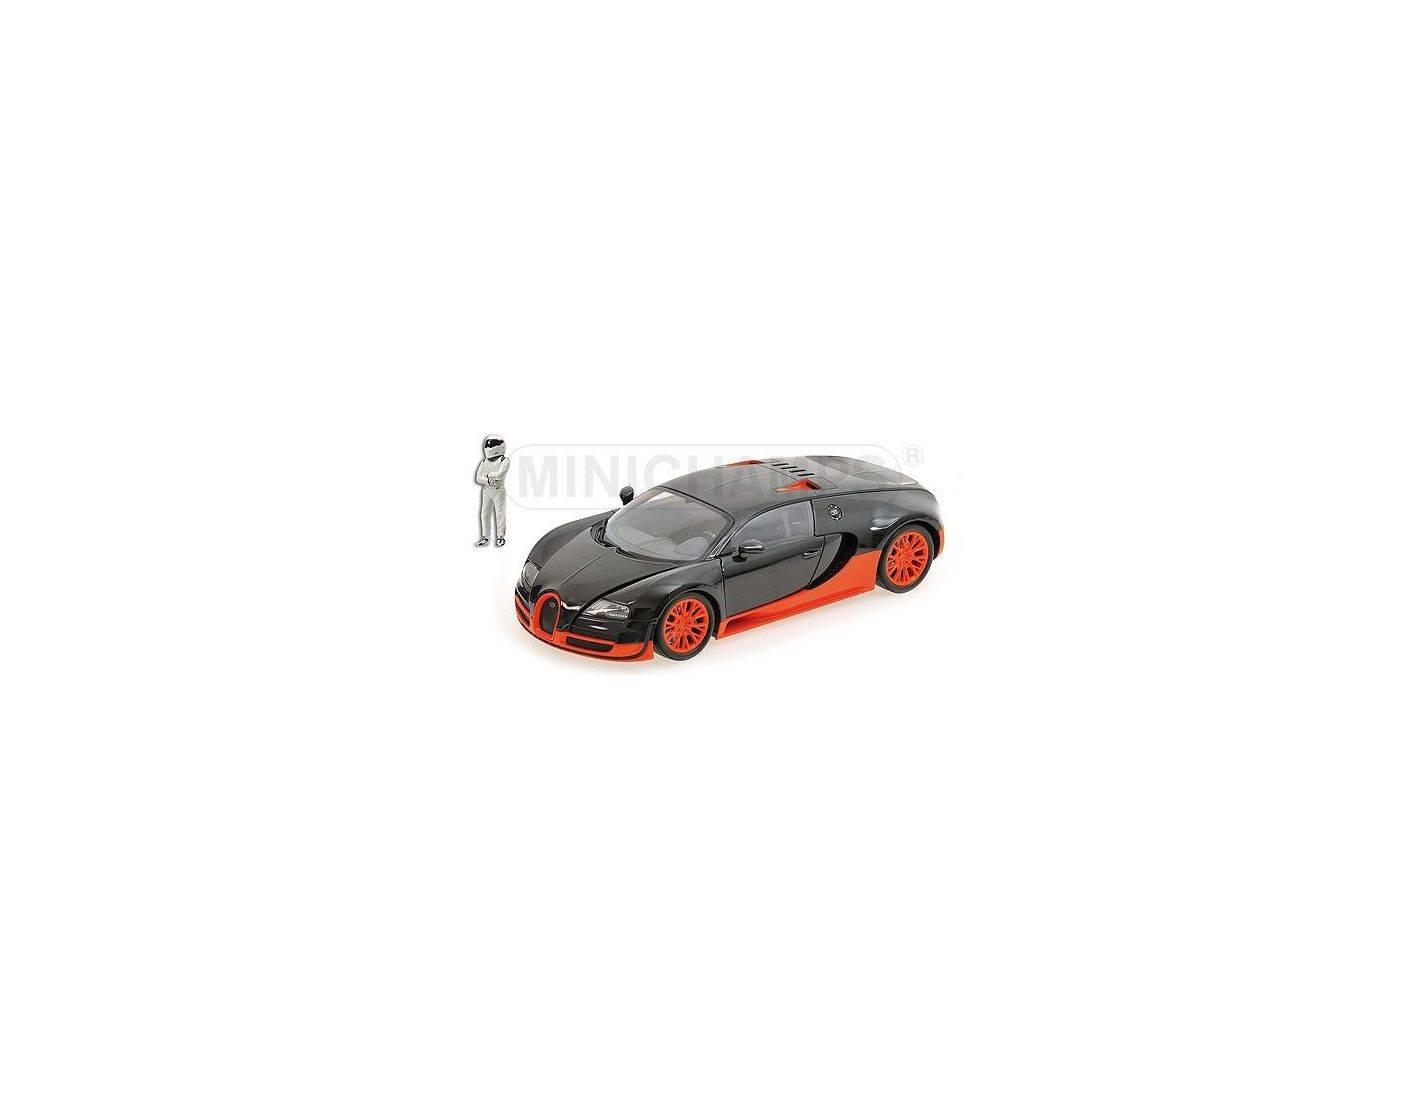 minichamps 519101101 bugatti veyron super sport carbon orange top gear modellino die cast models. Black Bedroom Furniture Sets. Home Design Ideas